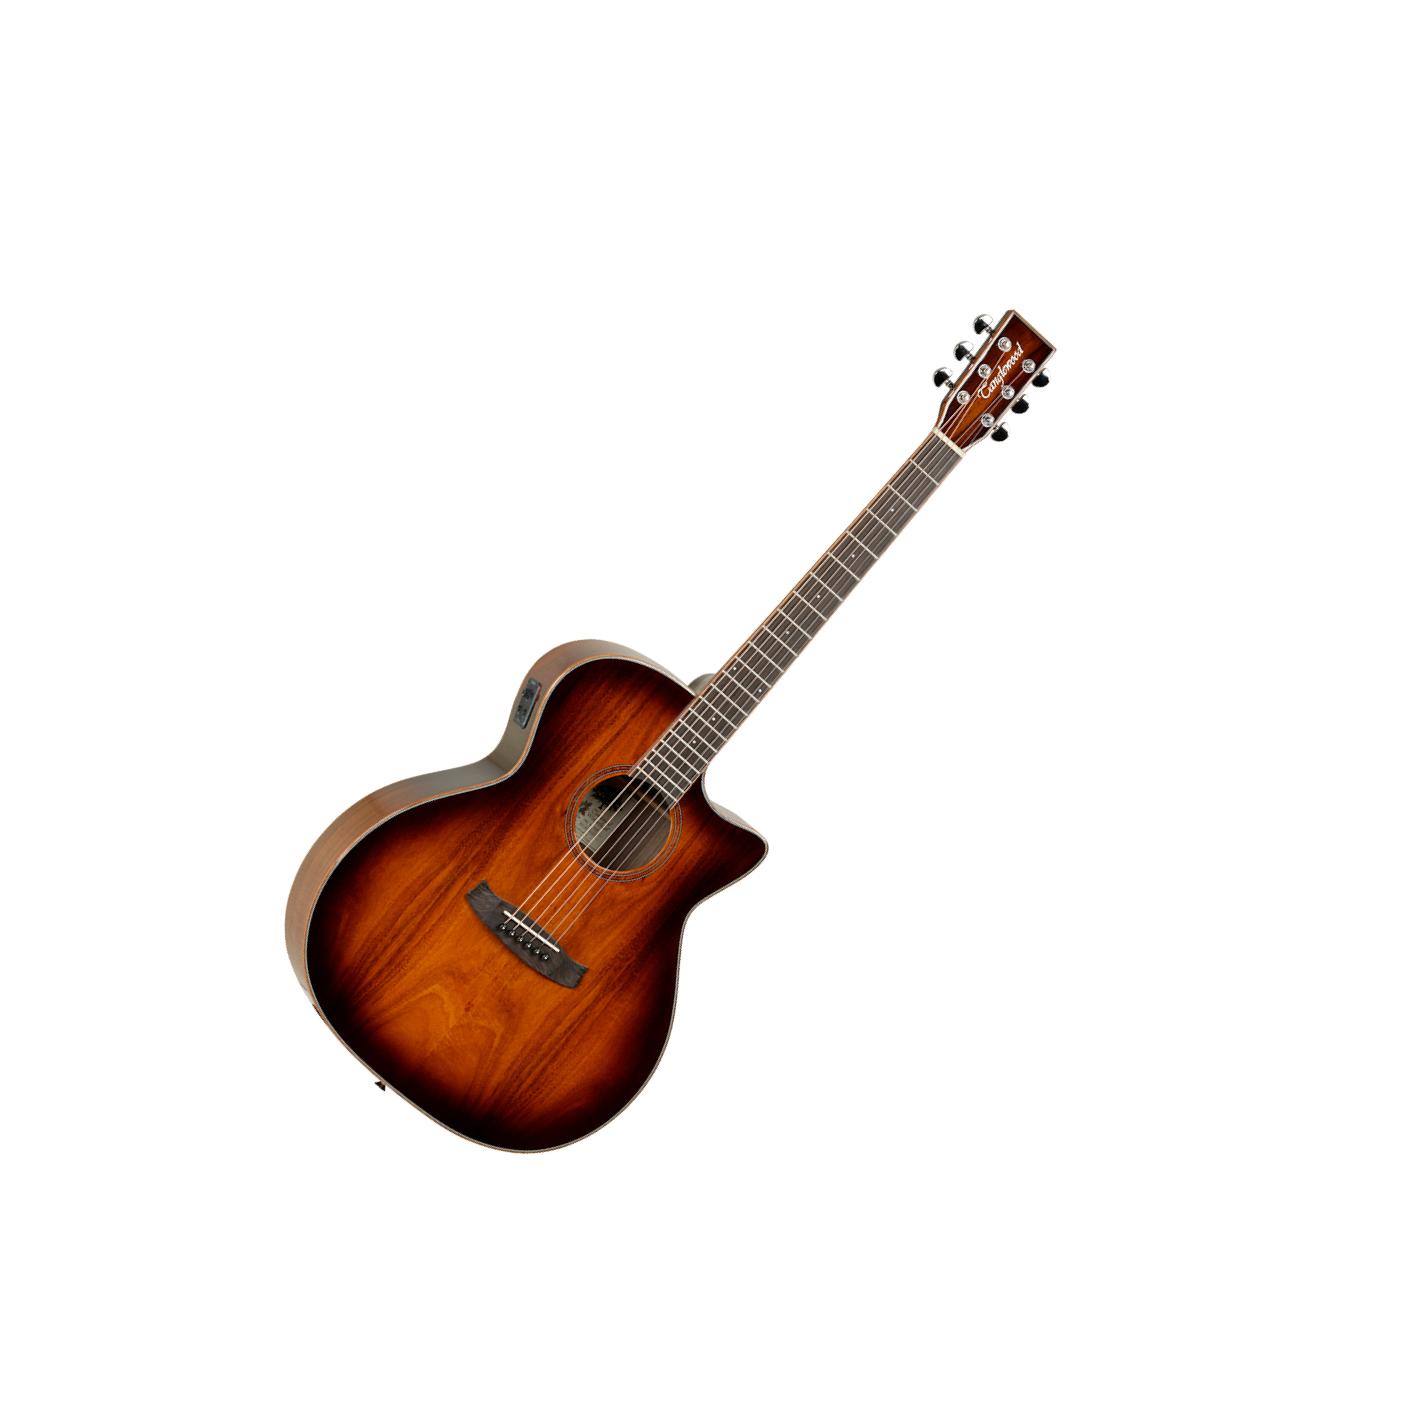 Tanglewood Winterleaf Exotic TW4E-VC-Koa Venetian Cutaway Electro Acoustic